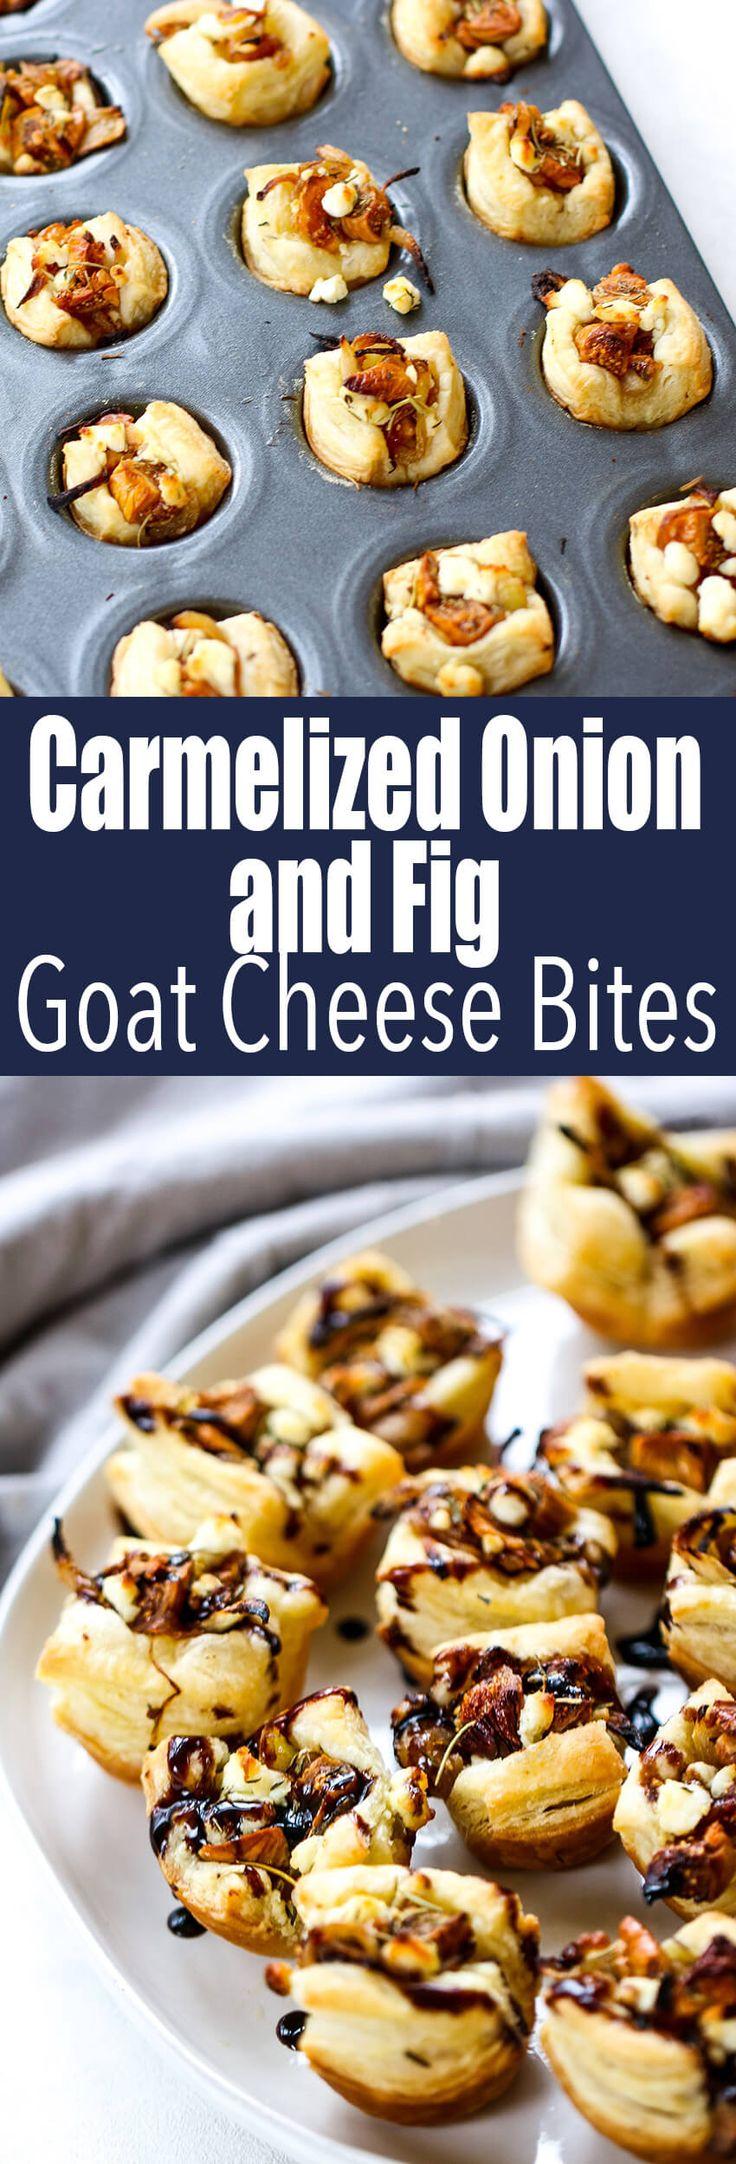 Caramelized Onion, Fig & Goat Cheese Bites